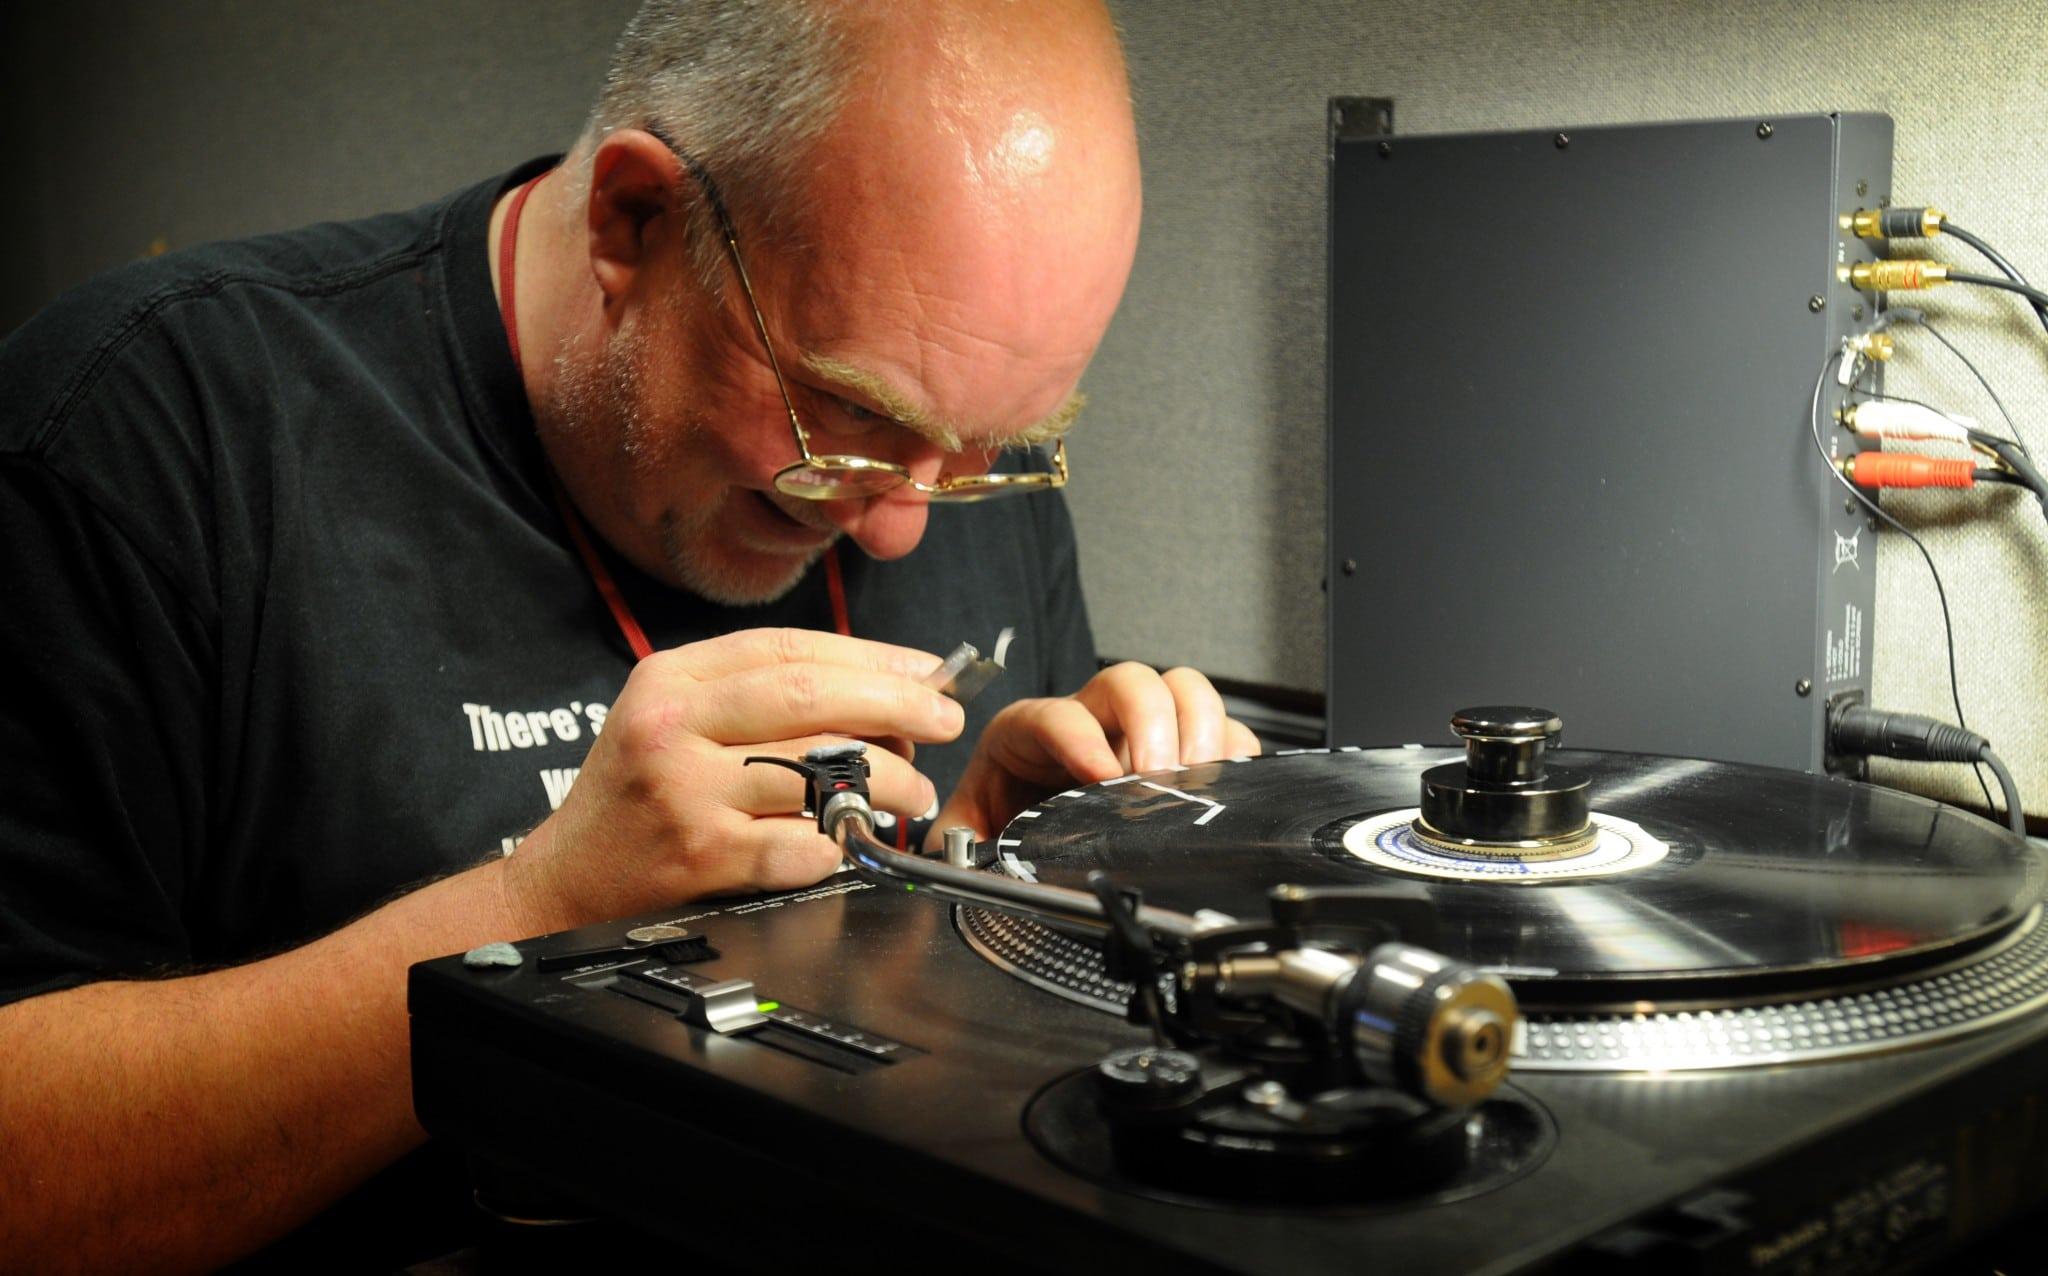 Acetate disc being repaired prior to digitisation